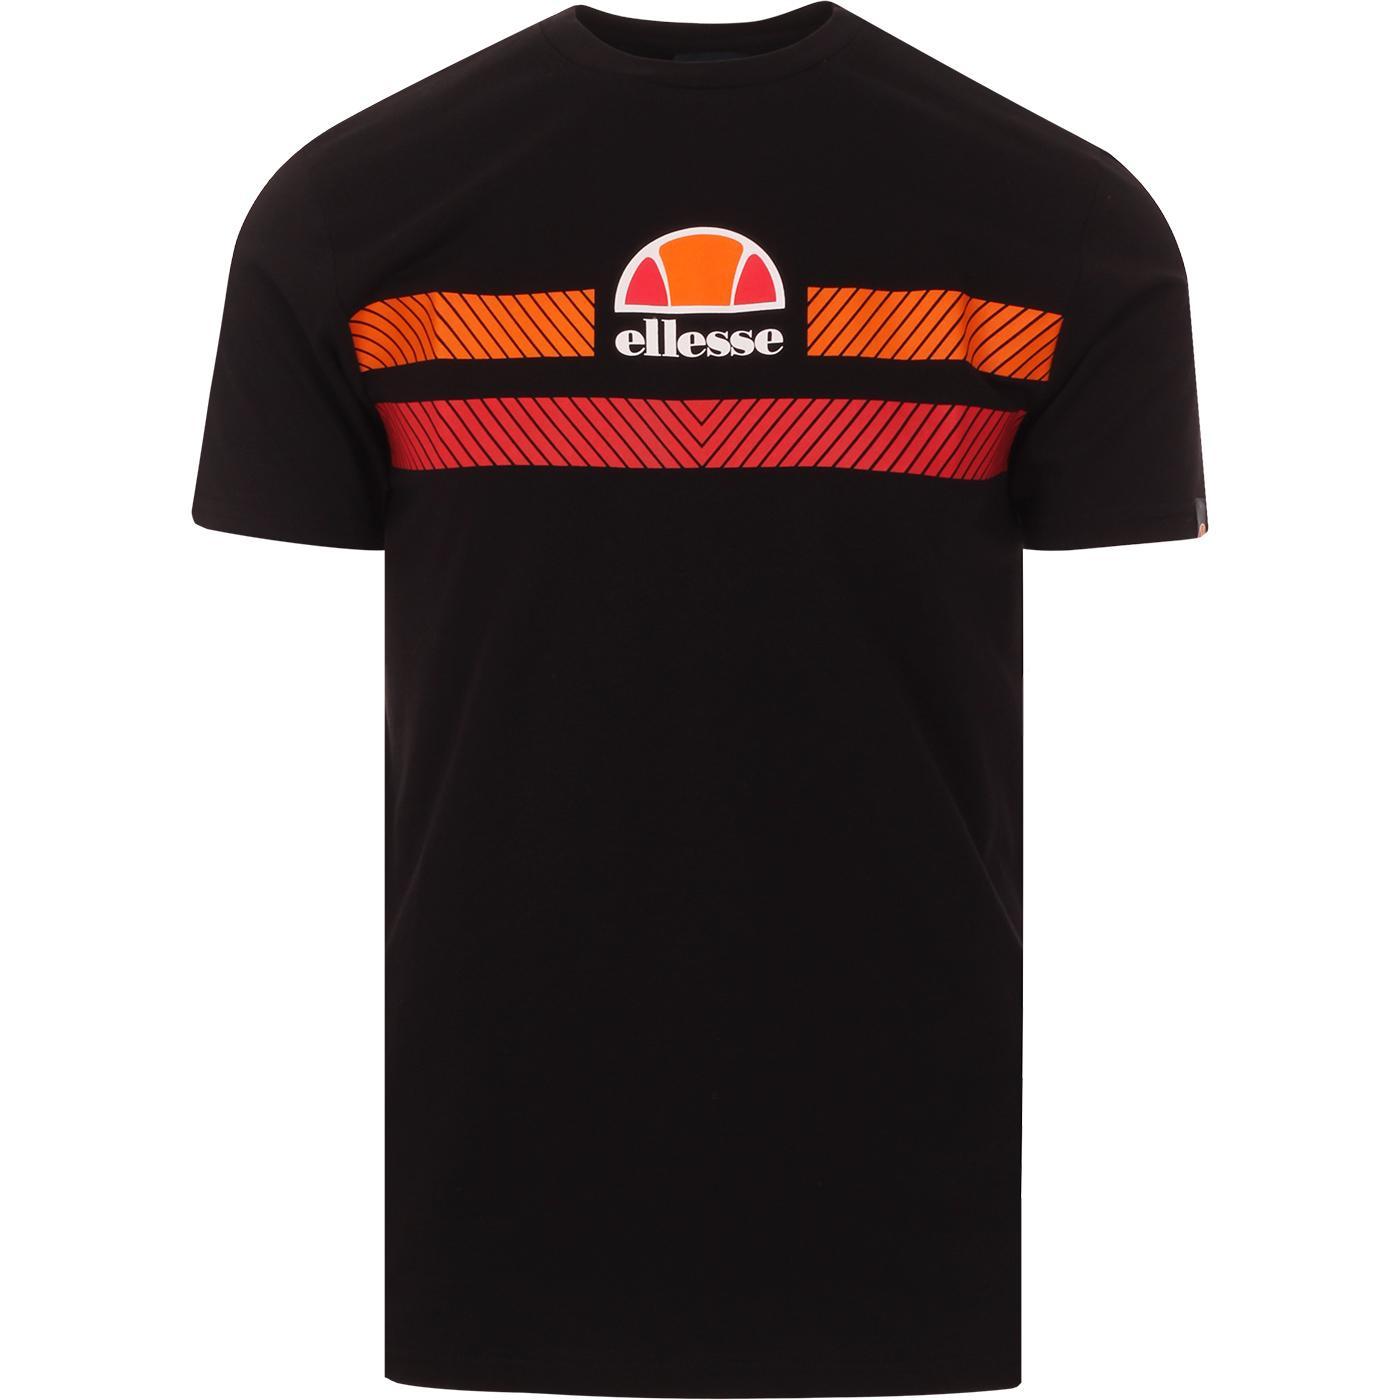 Glisenta ELLESSE 80s Chevron Stripe Logo Tee BLACK